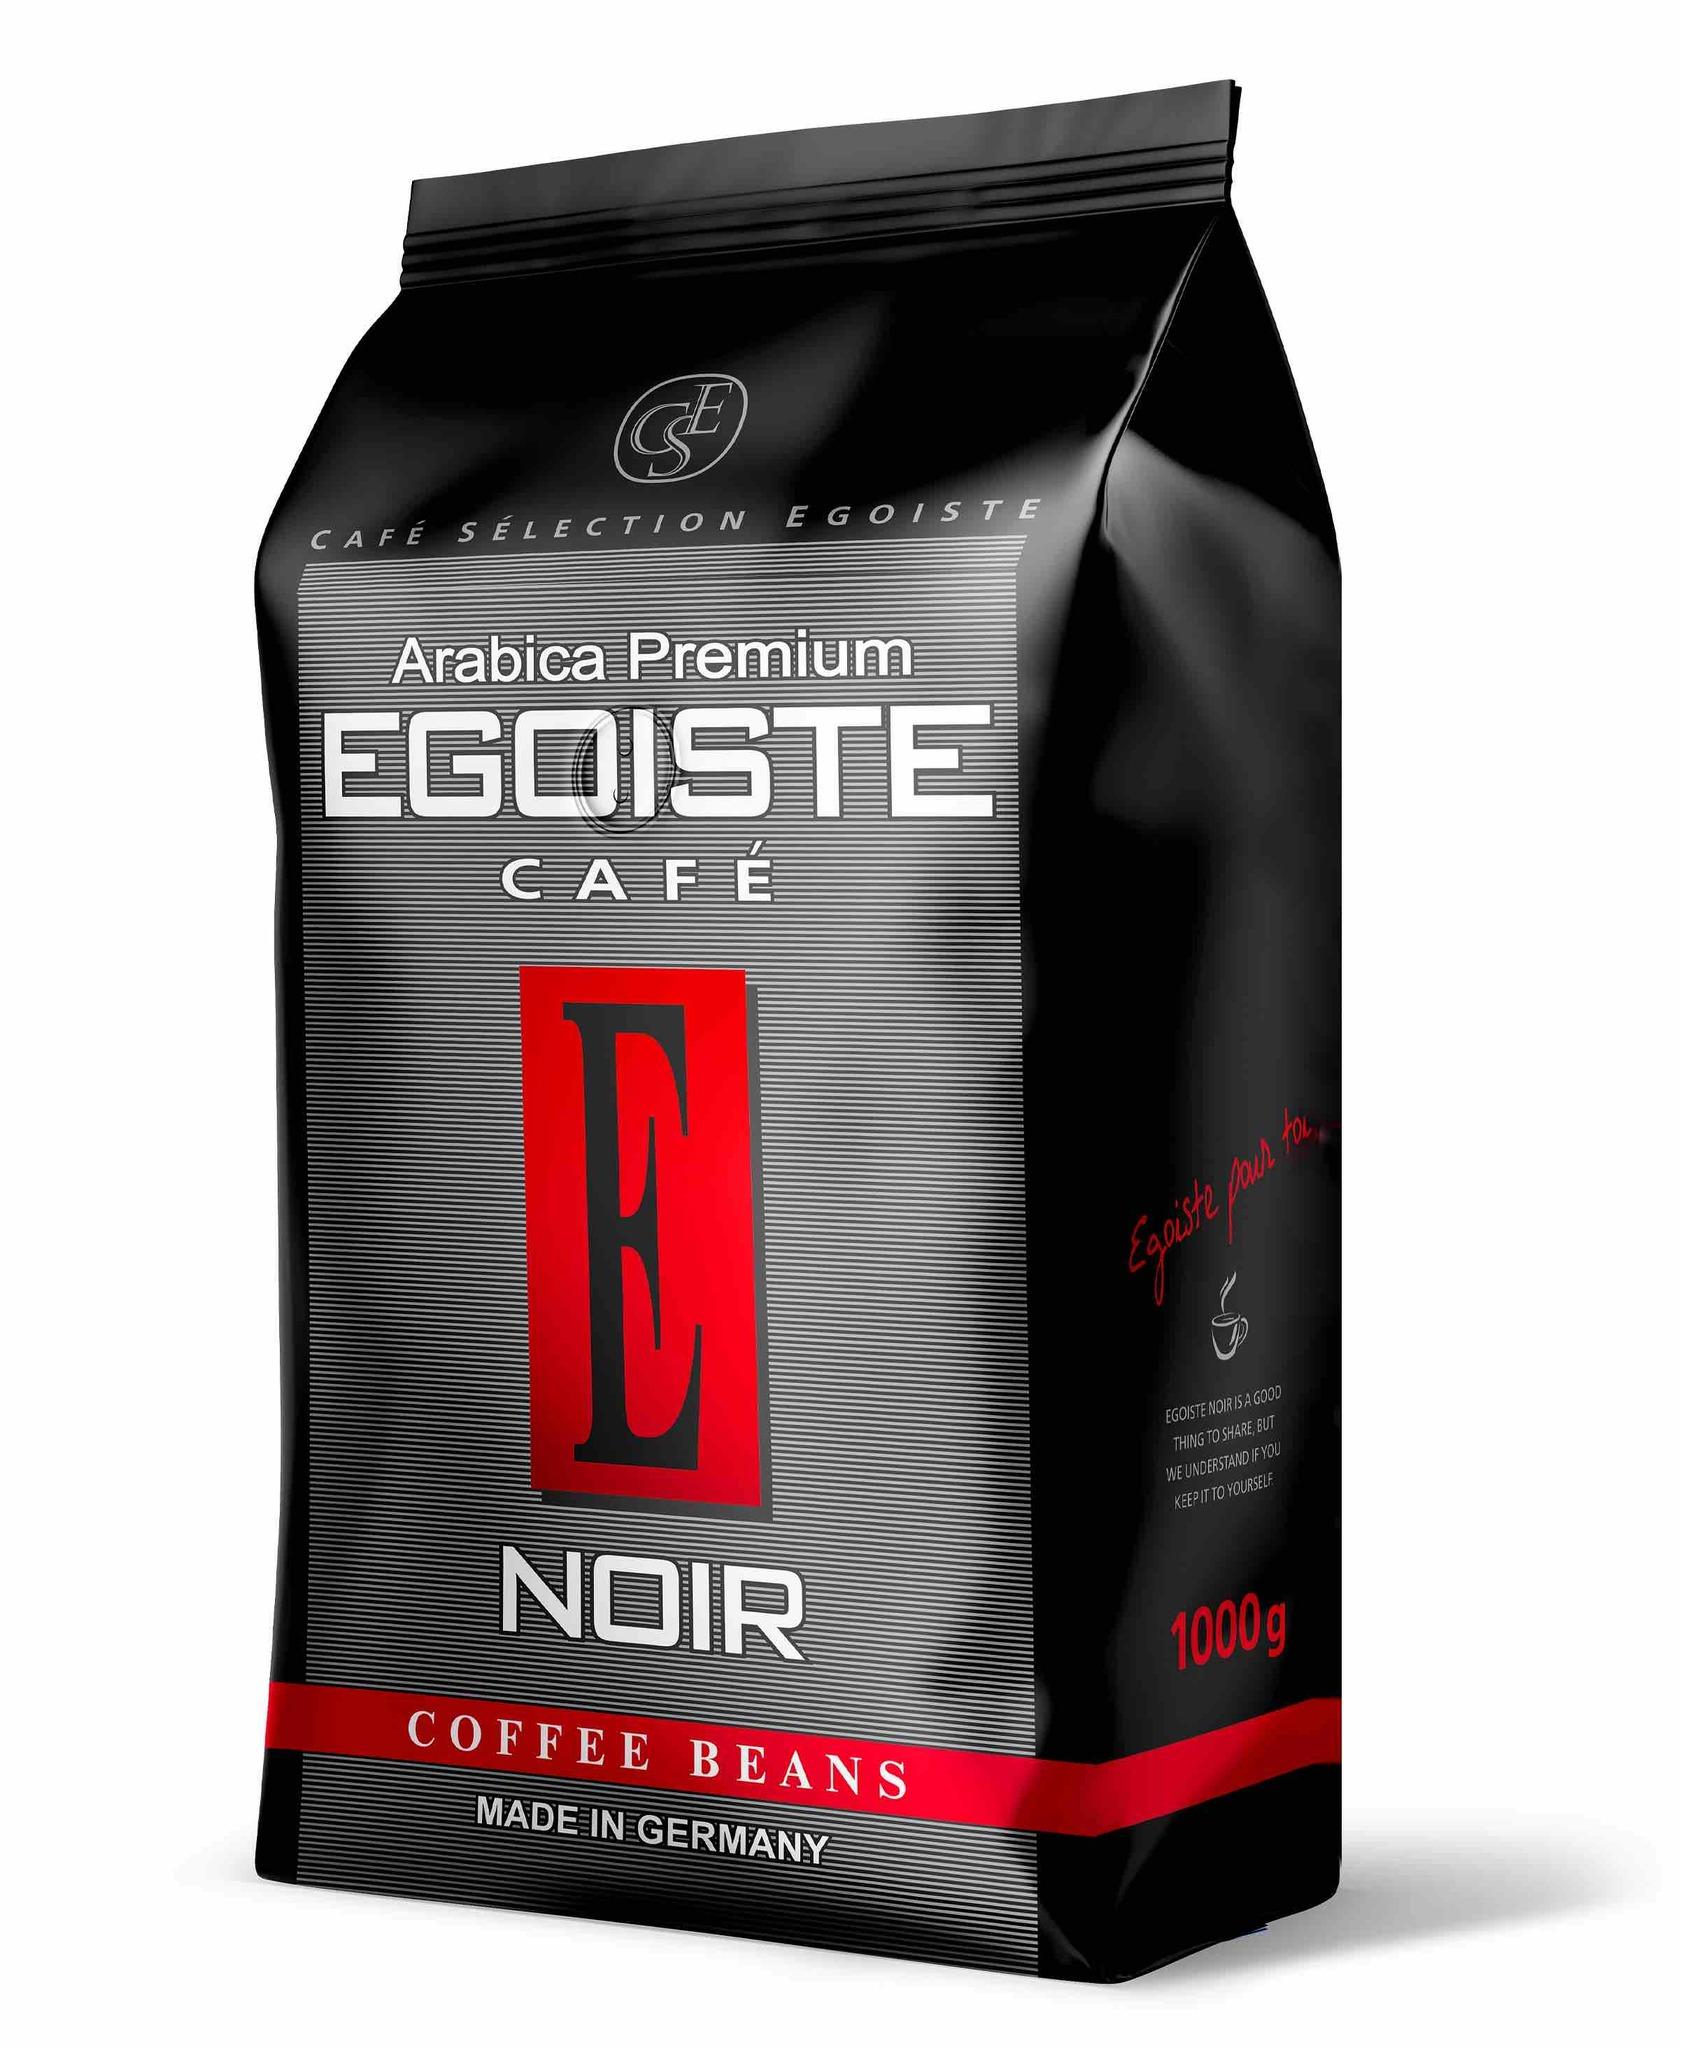 Кофе в зернах Кофе в зернах Noir, Egoiste, 1 кг import_files_0a_0a6e3d51cb2511eaa9ce484d7ecee297_2f451855cdab11eaa9ce484d7ecee297.jpg